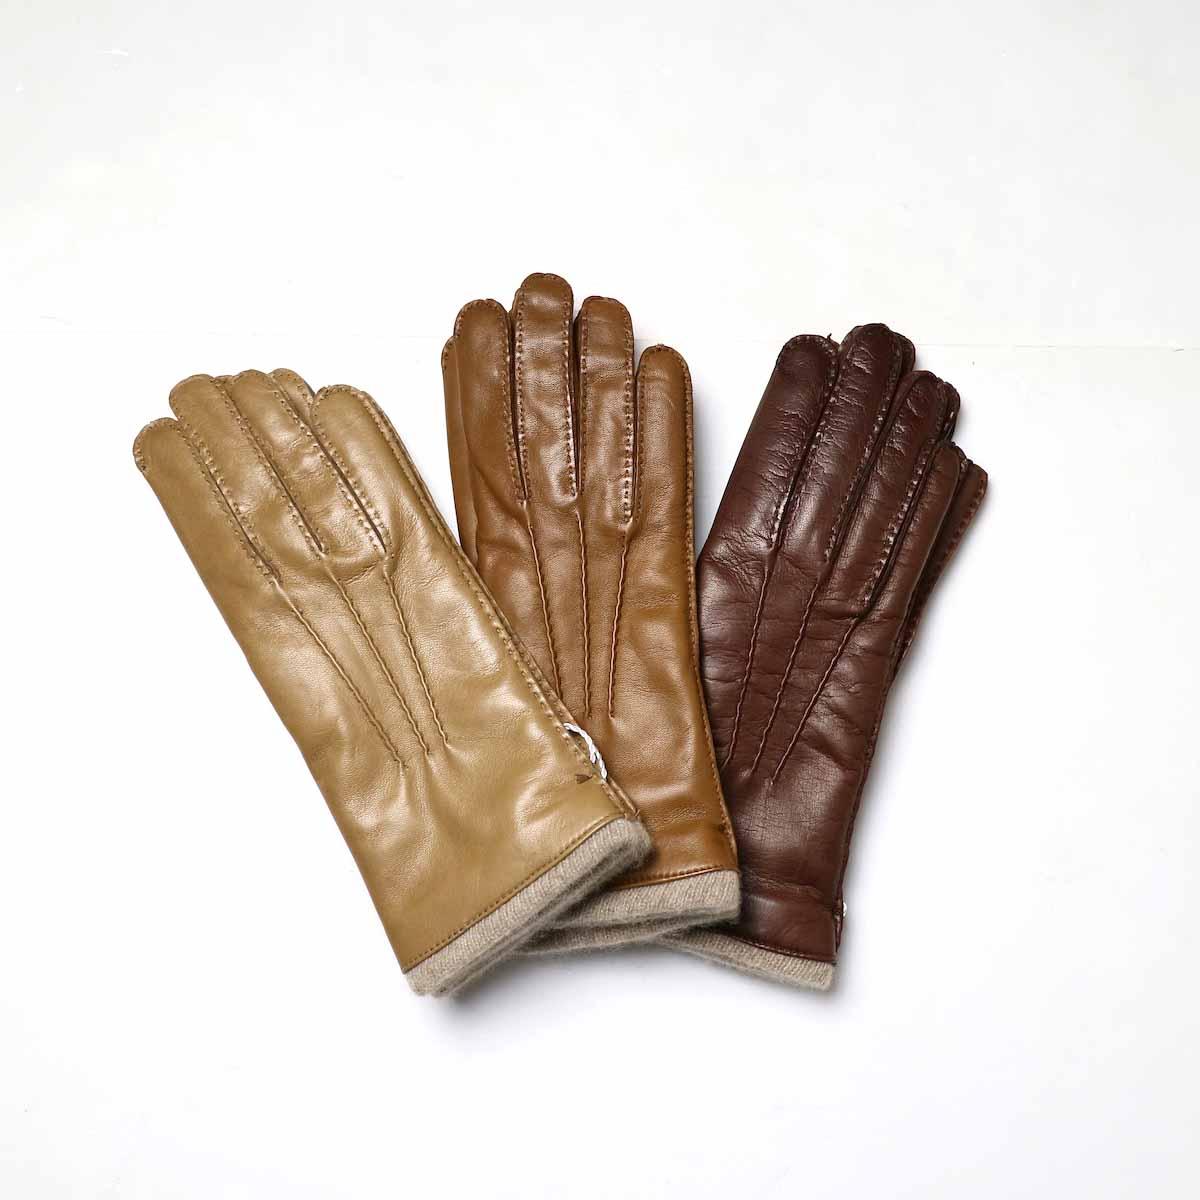 Italguanto / Leather Glove 全体